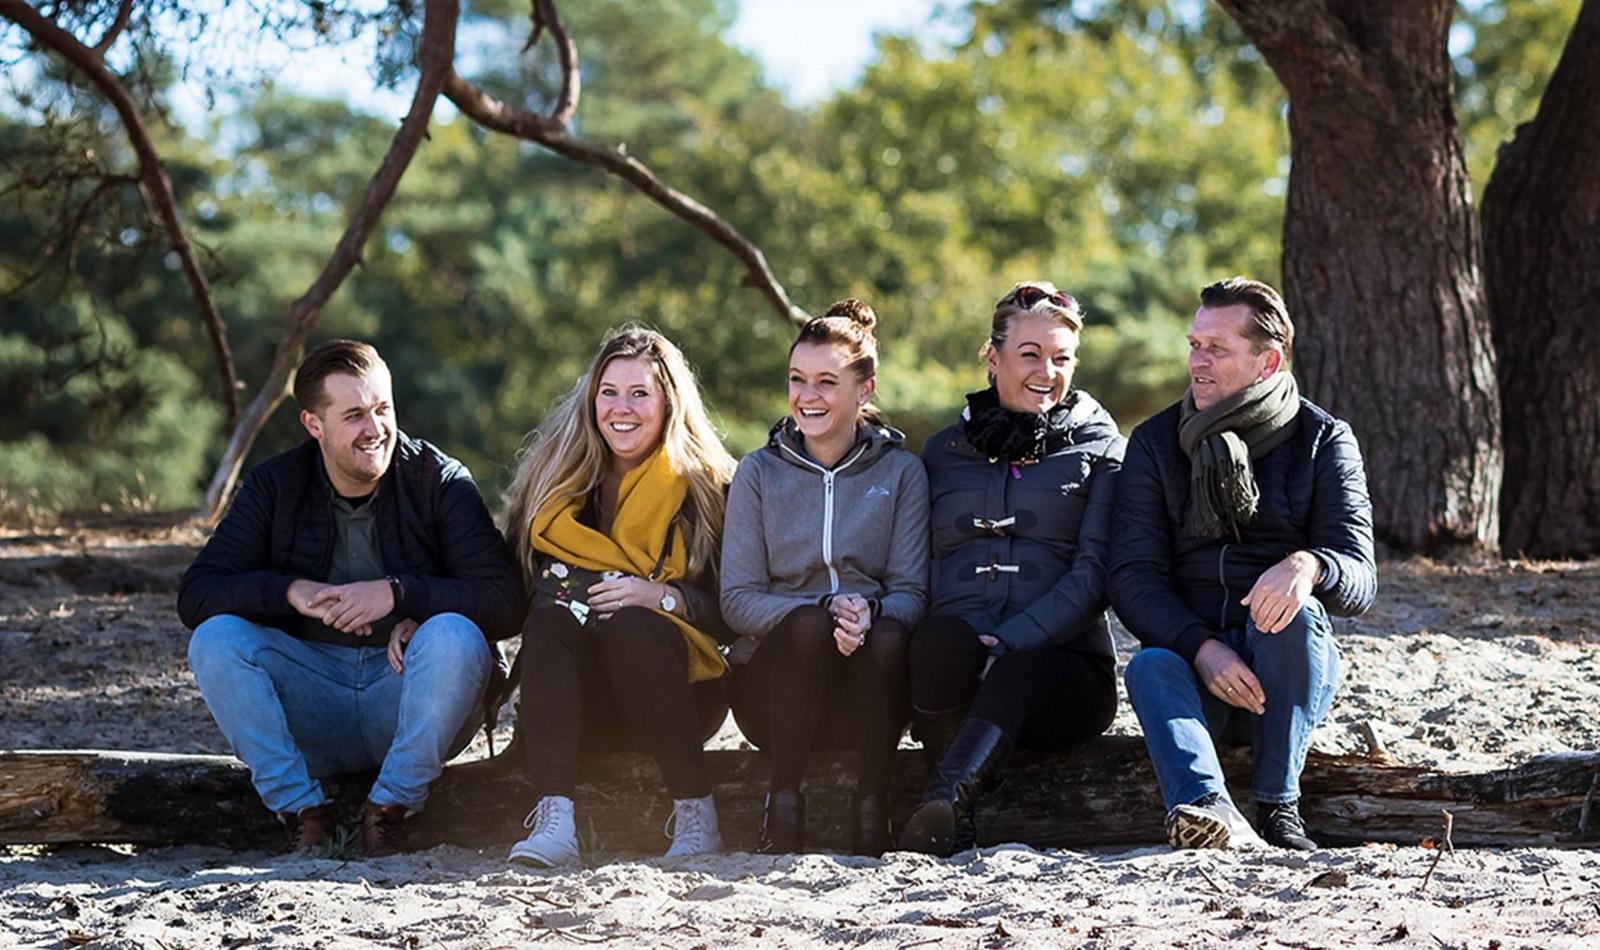 Soest Soesterduinen Familiefoto